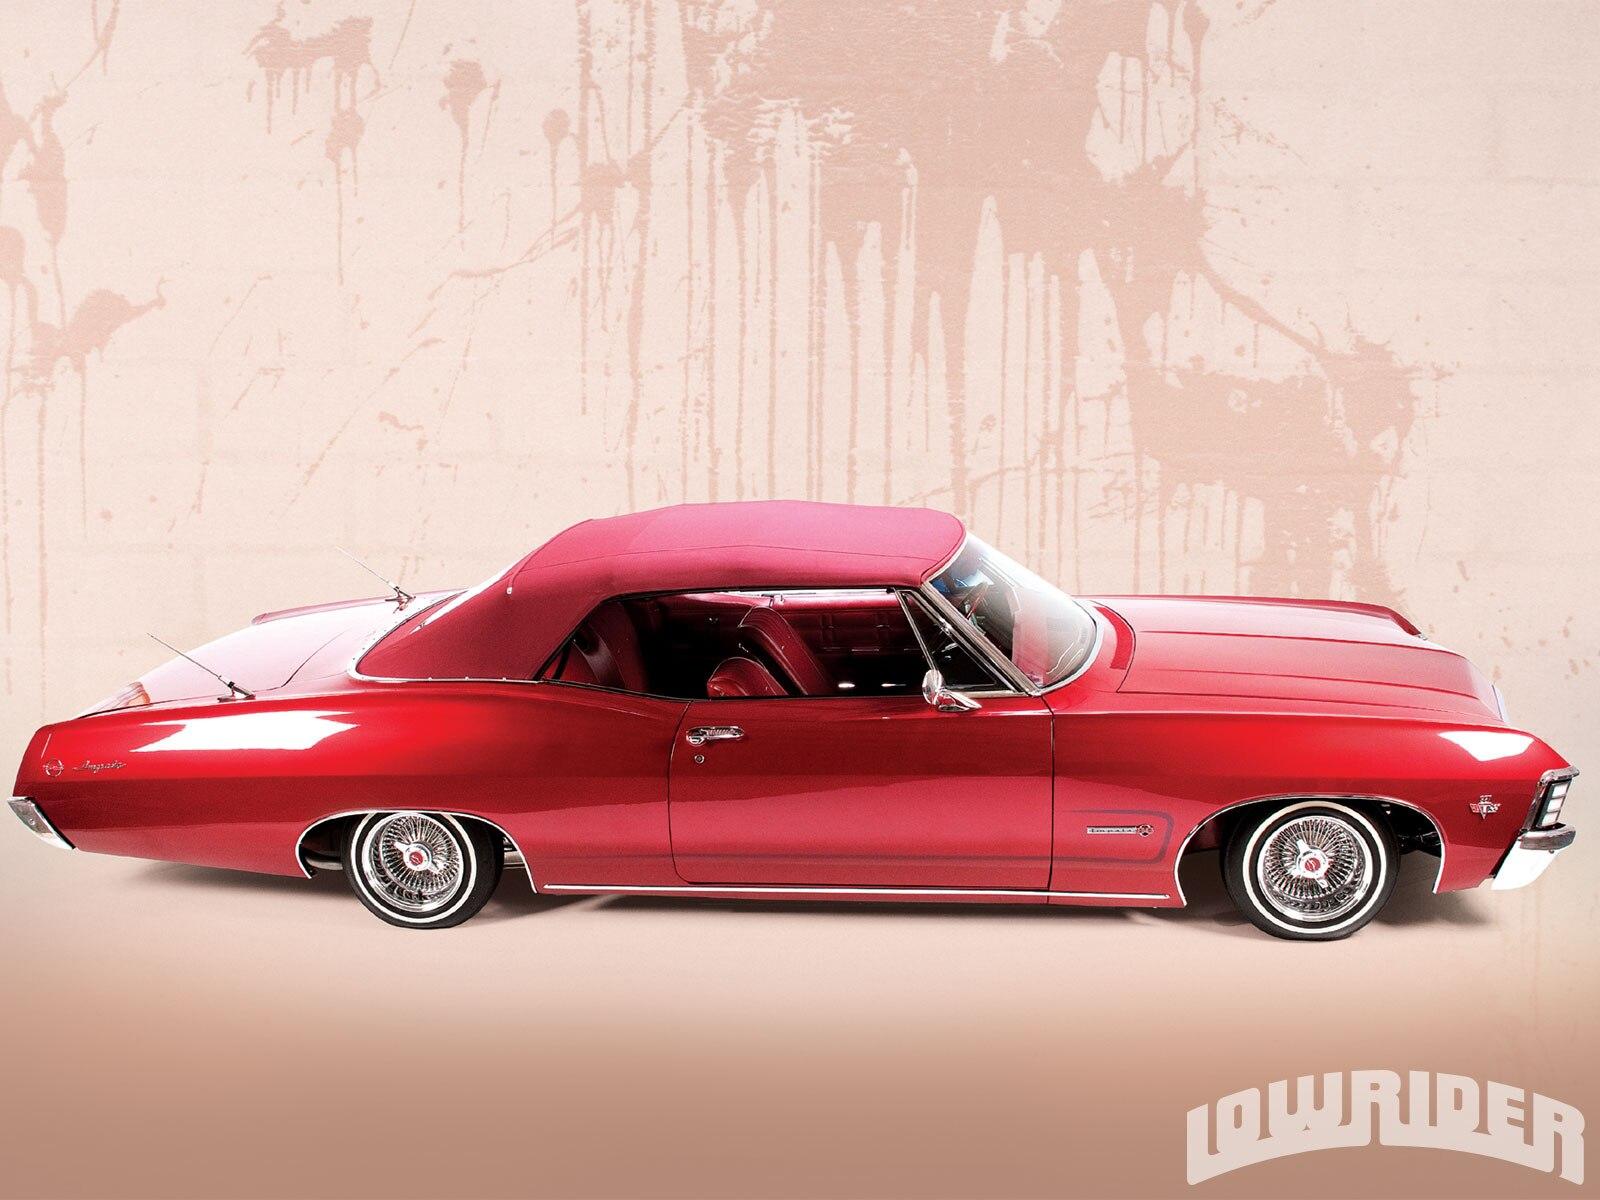 lrmp-1010-02-o-1967-chevrolet-impala-side-view2